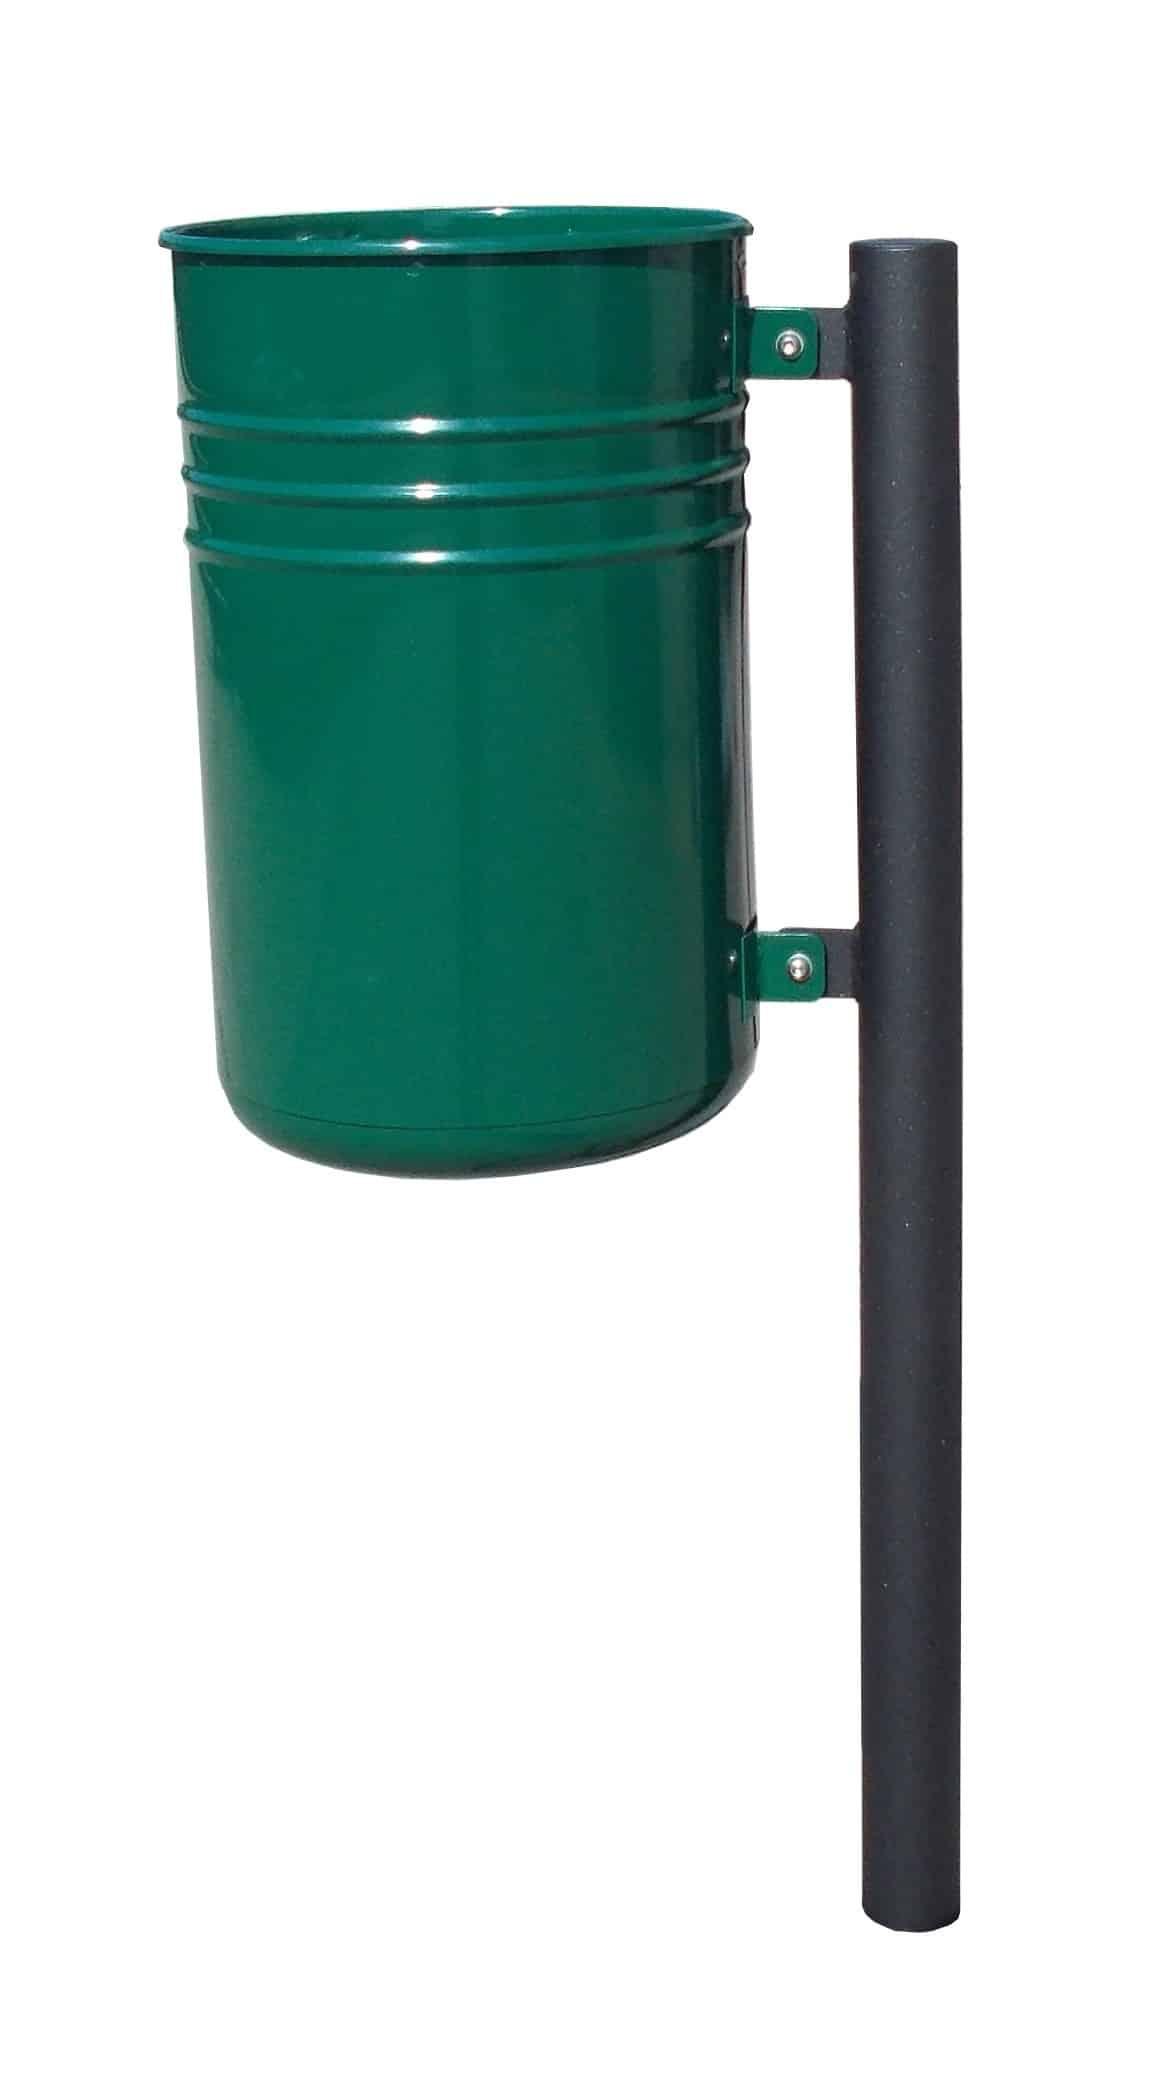 Mülleimer Pisa Produktbild